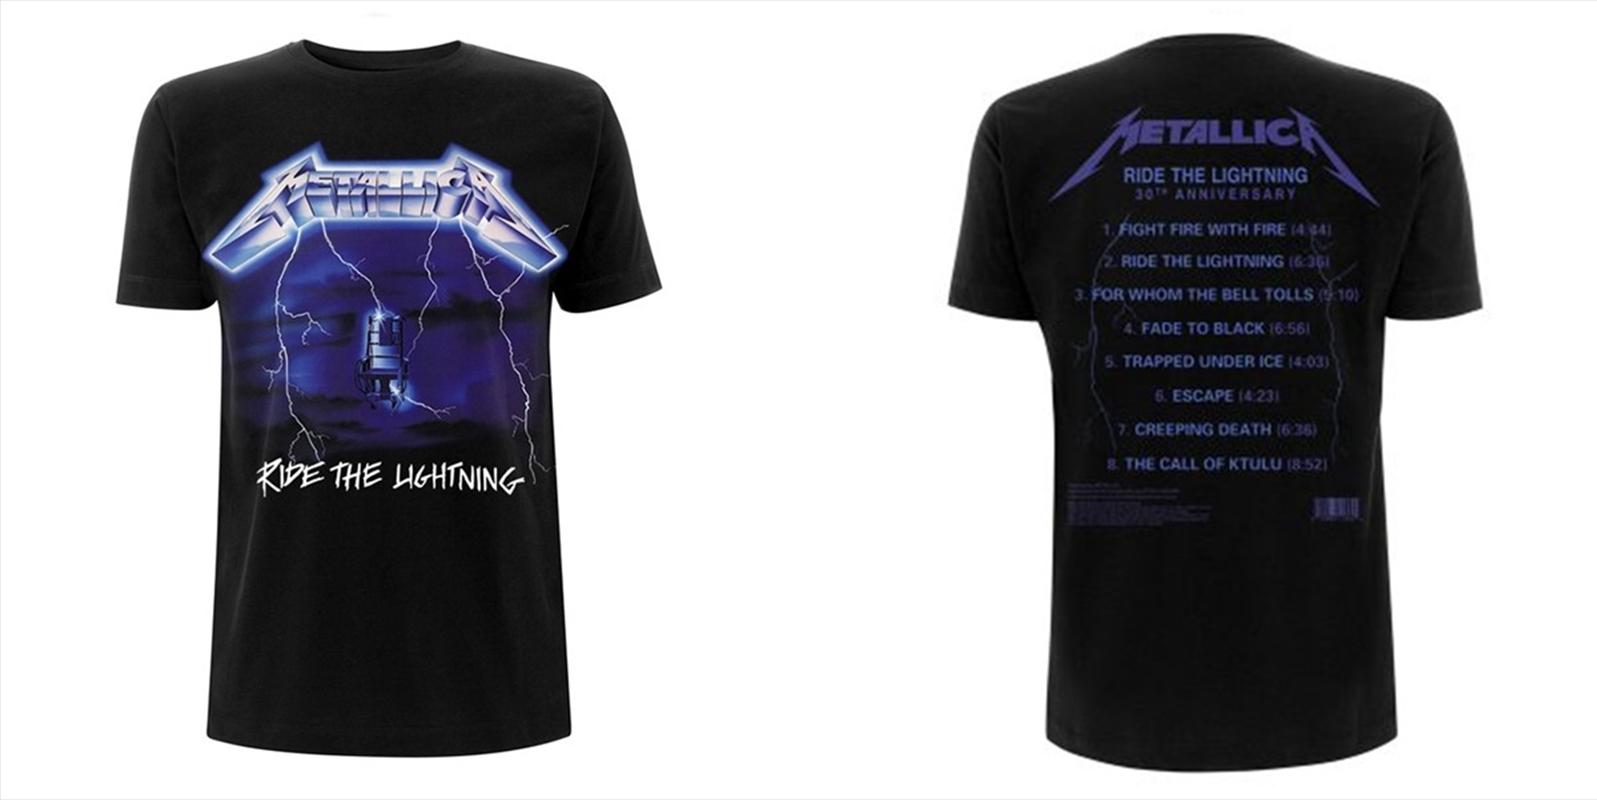 Metallica Ride The Lightning: Tshirt XXL | Apparel